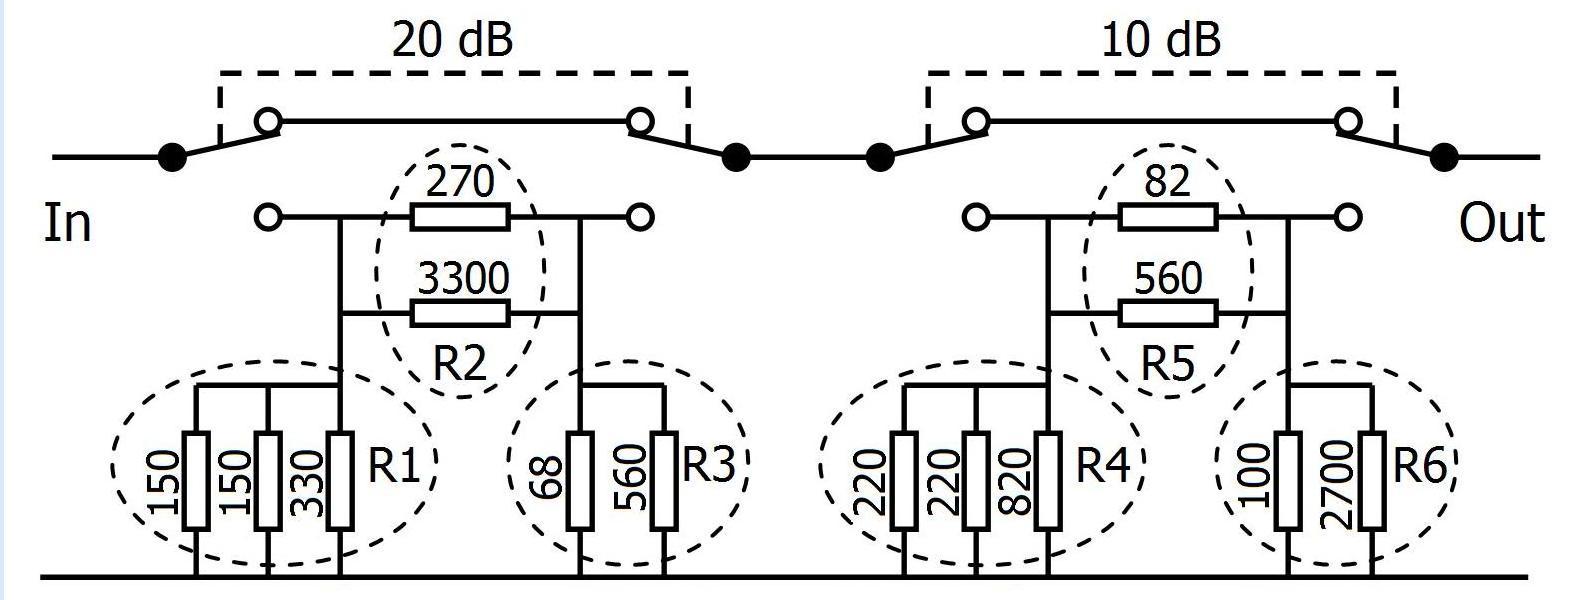 pa1b u0026 39 s qrpp blog  power attenuators for the ft